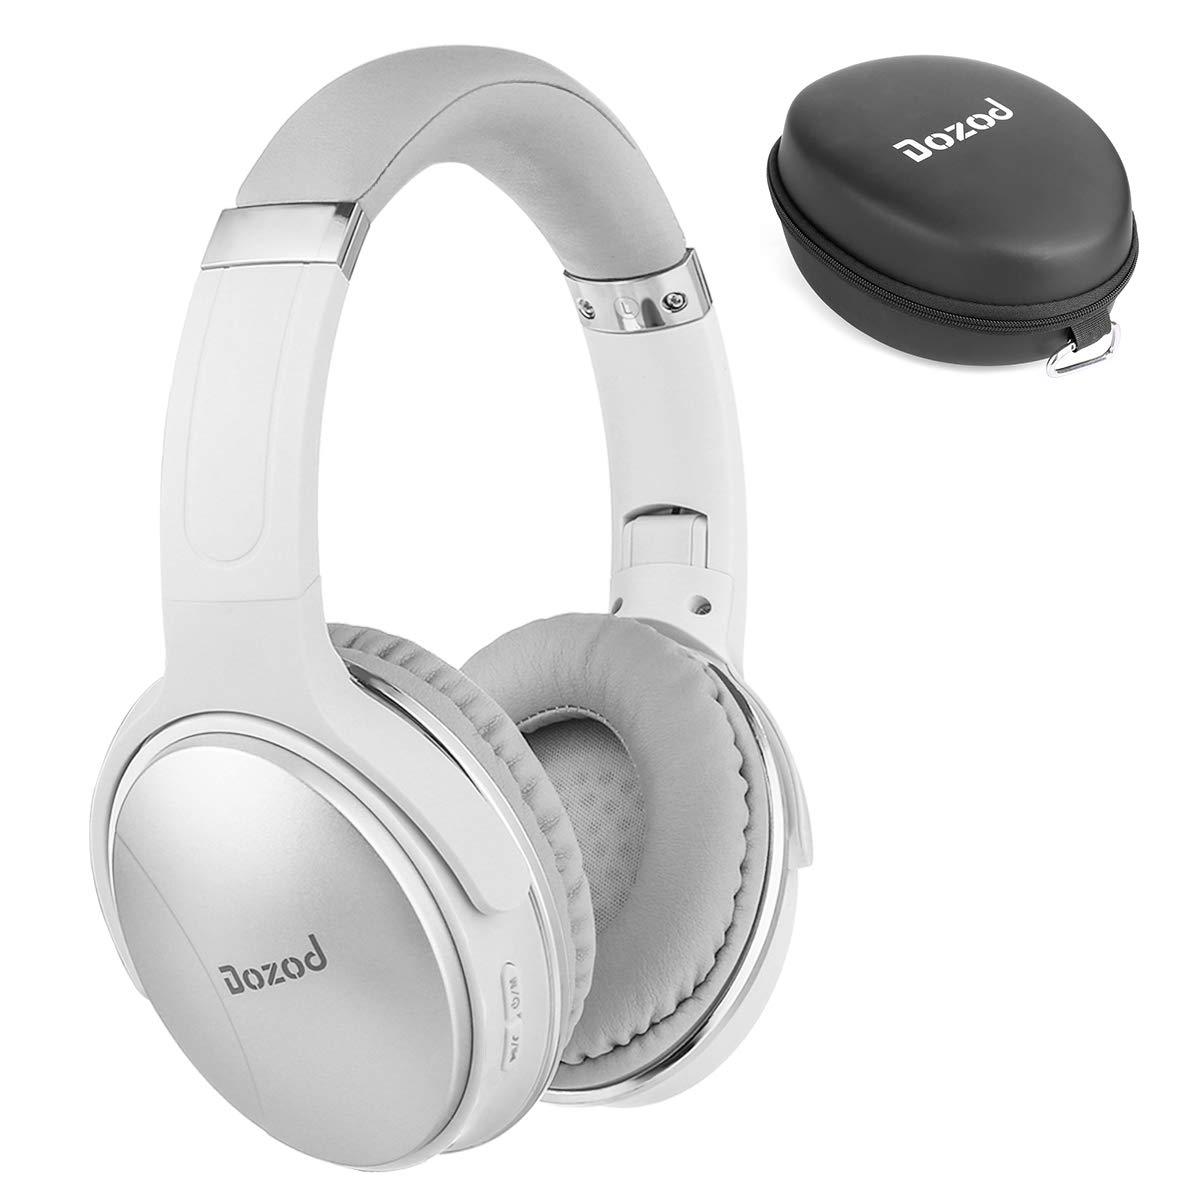 Bluetooth Over Ear Headphones, Dozod Foldable Wireless Hi-Fi Stereo Headset with Mic, Rechargeable Bluetooth and Wired Headphones for TV/PC/Cell Phones